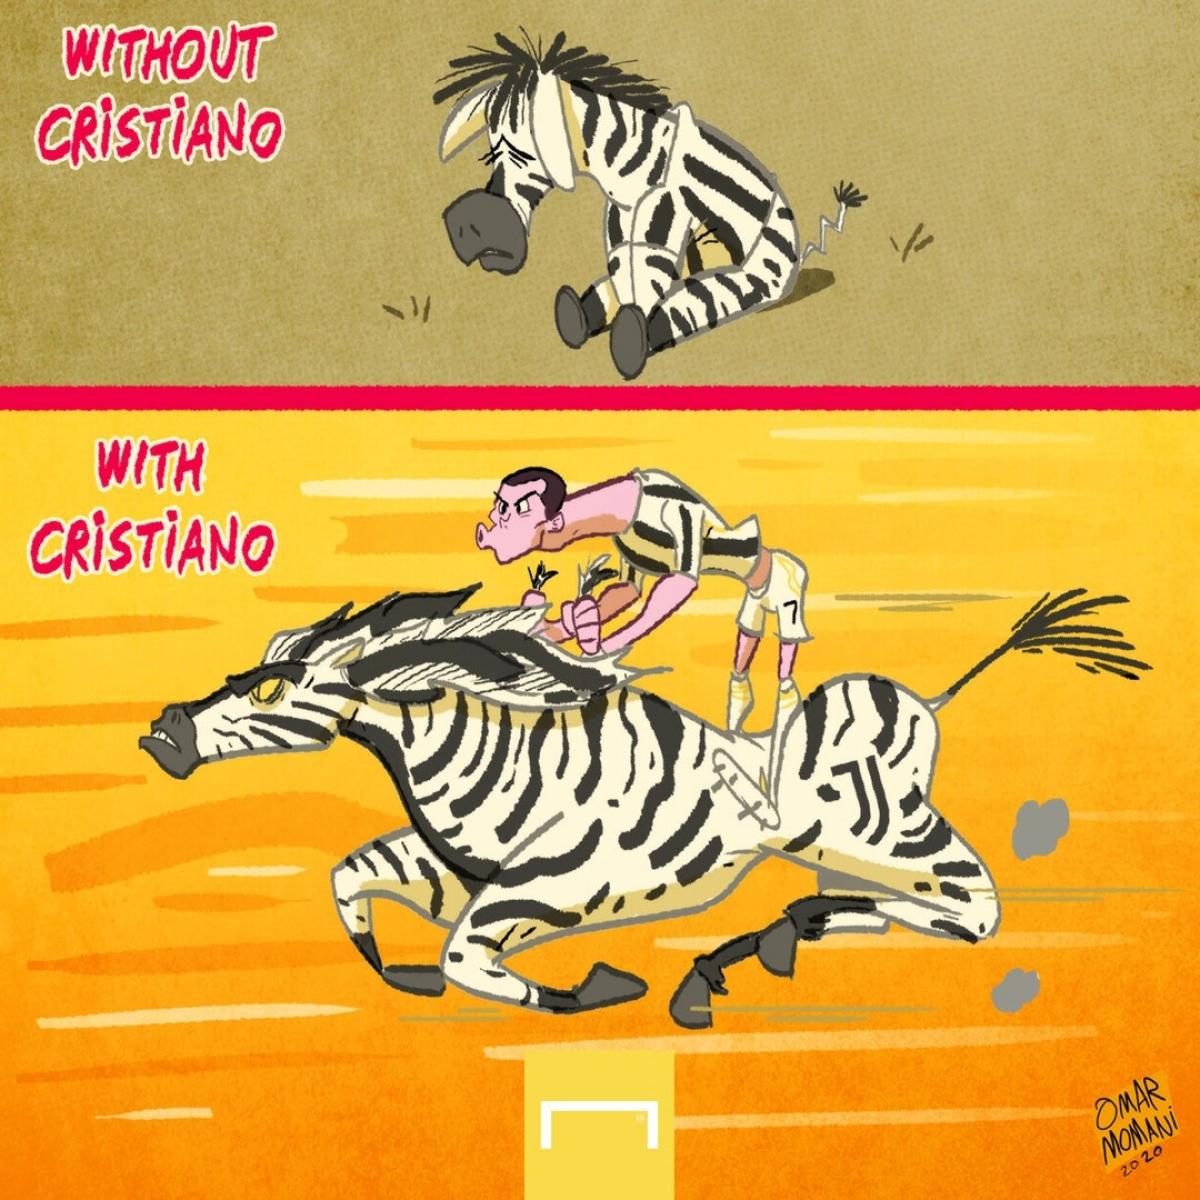 Juventus khi có Ronaldo và khi vắng Ronaldo. (Ảnh: Omar Momani)